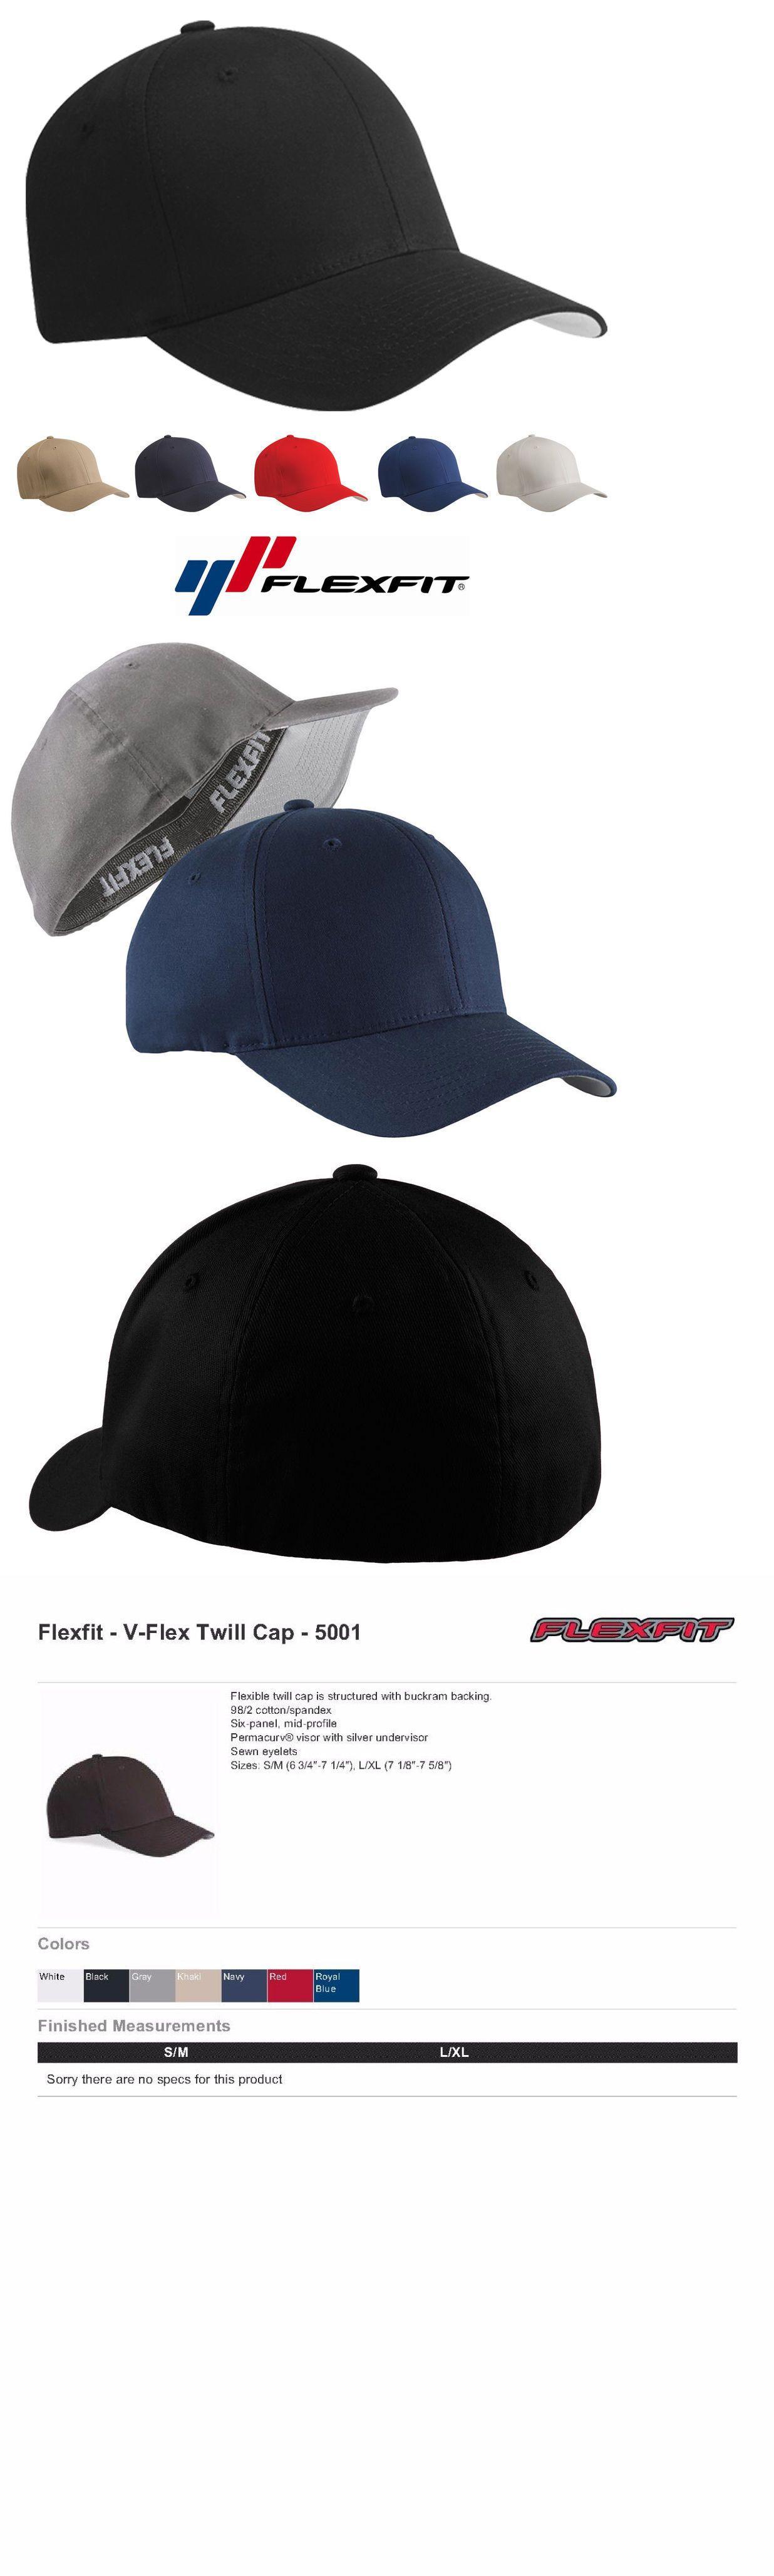 Hats 52365  Wholesale Flex Fit 5001 V-Flexfit Cotton Baseball Cap Fitted  Ballcap Blank Hat -  BUY IT NOW ONLY   39 on  eBay  wholesale  cotton   baseball ... 877e7a736c9c